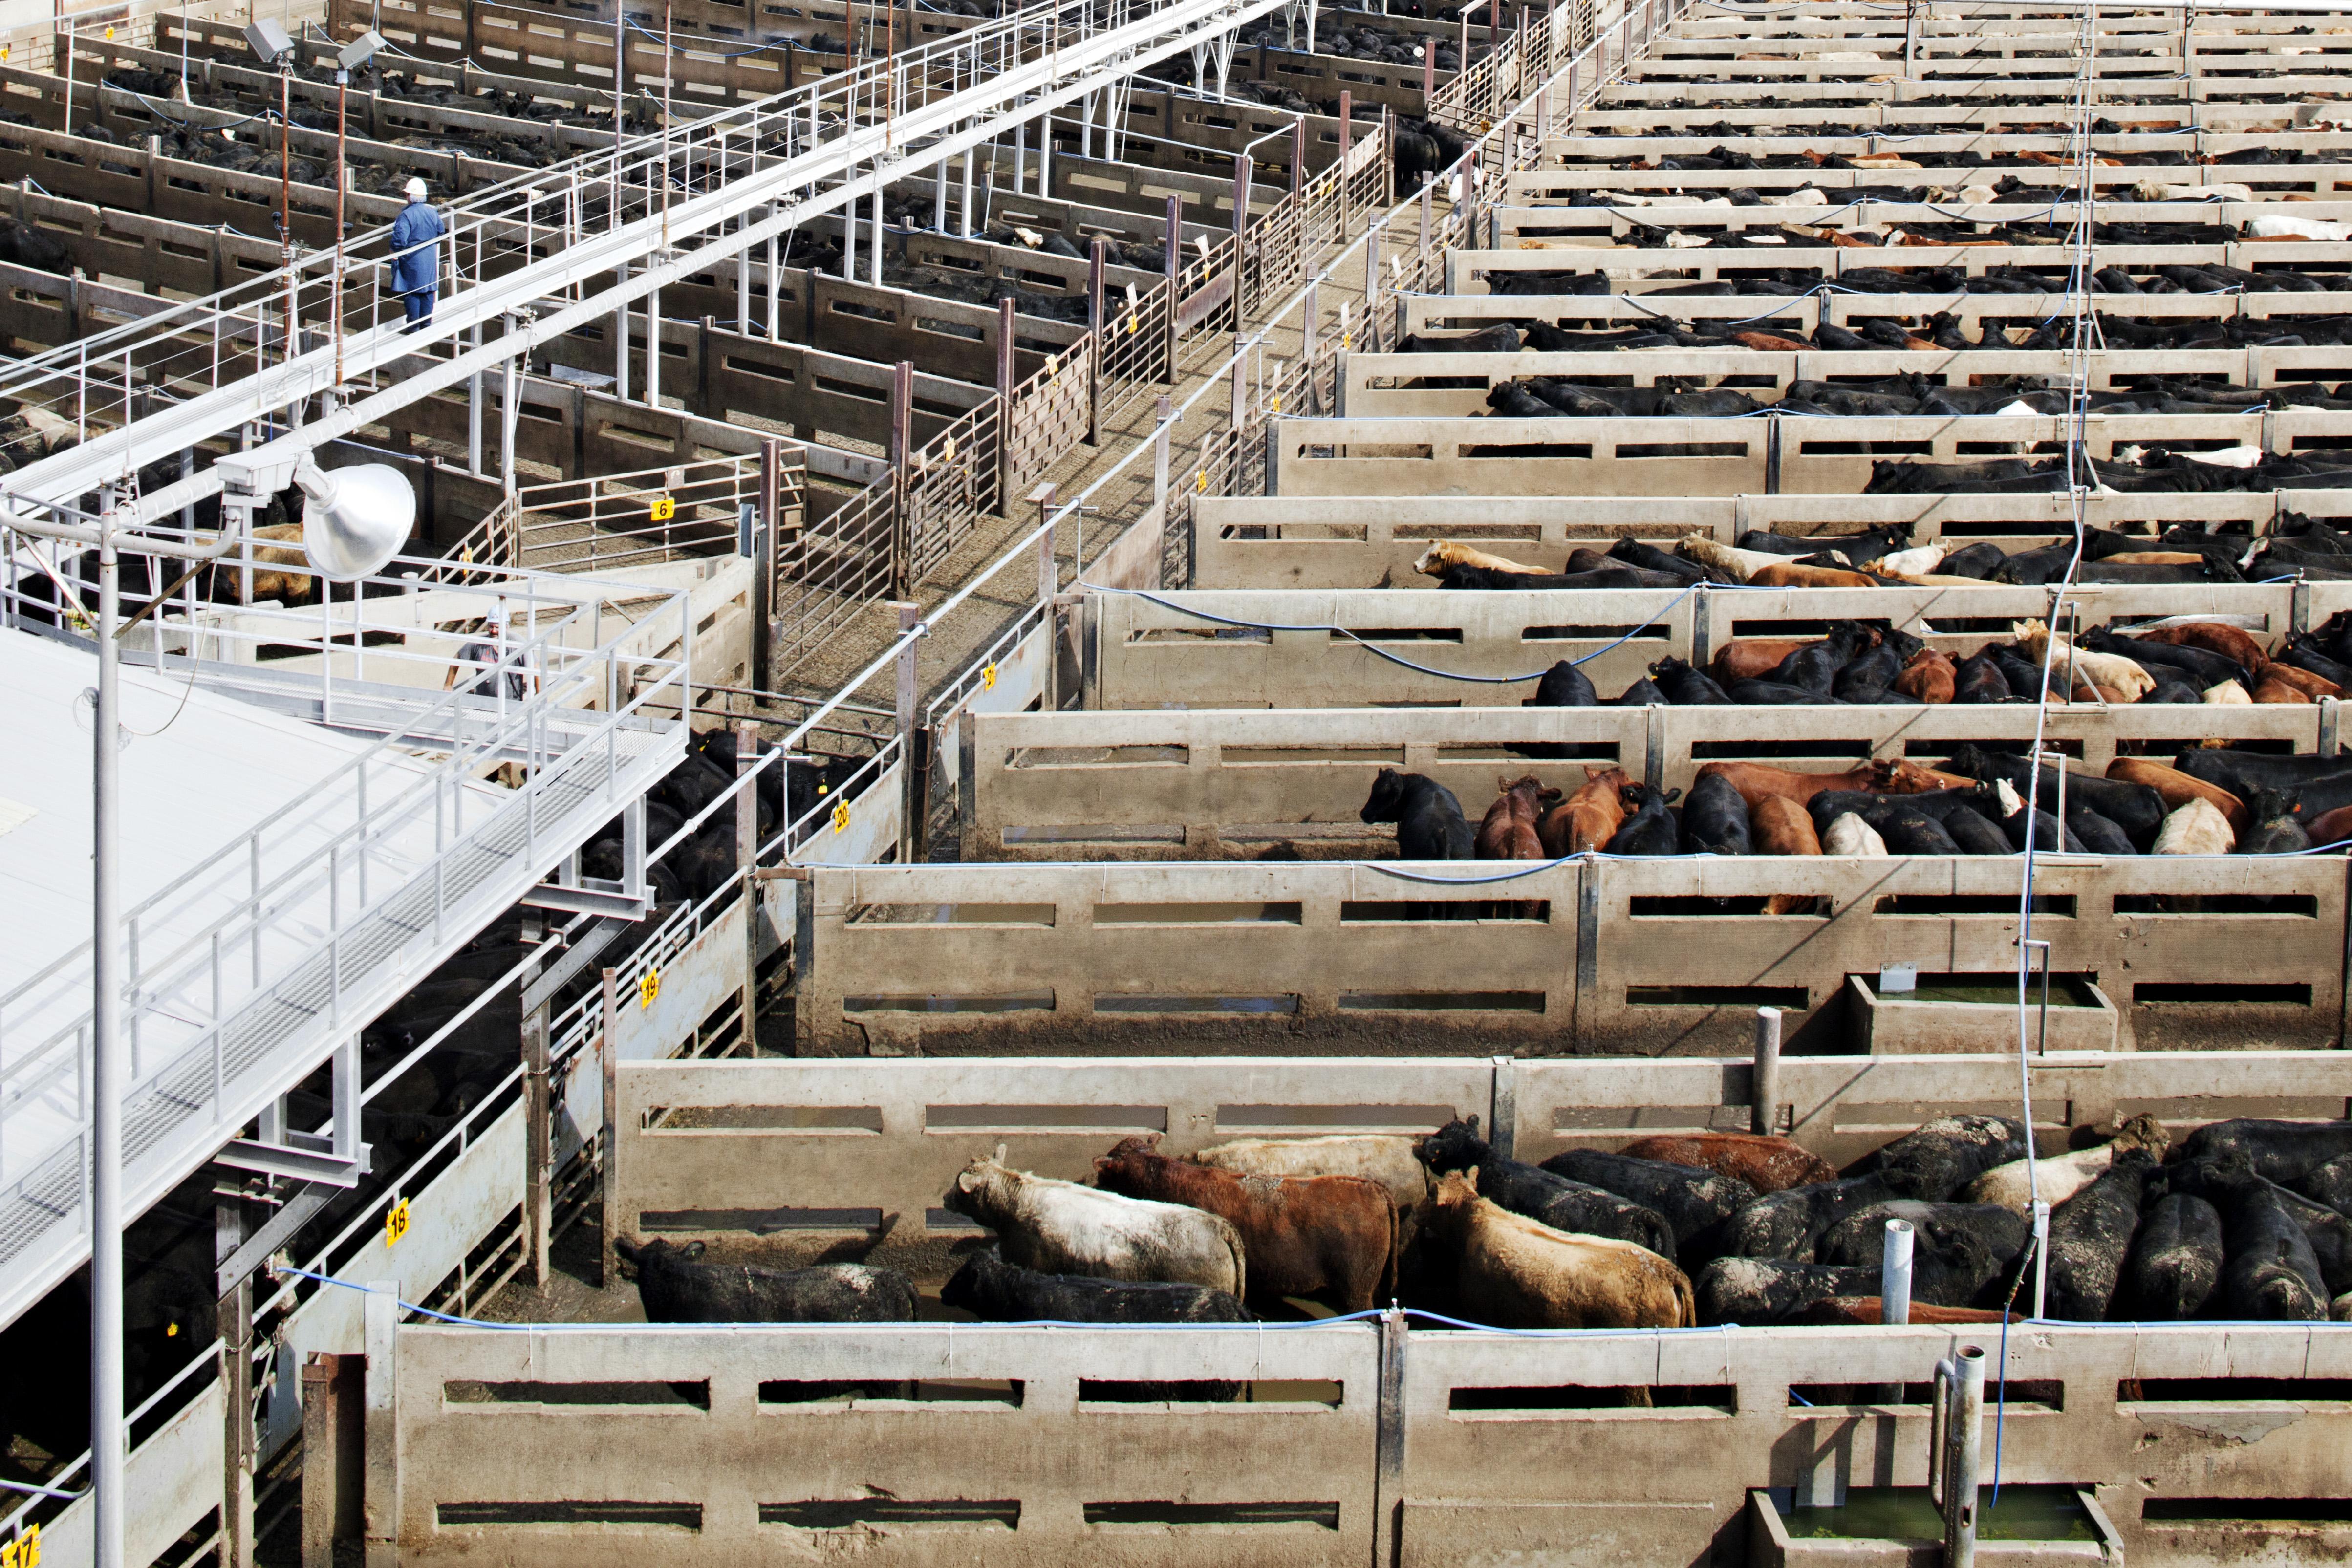 Beef cows at Cargill's Schyler, Nebraska facility